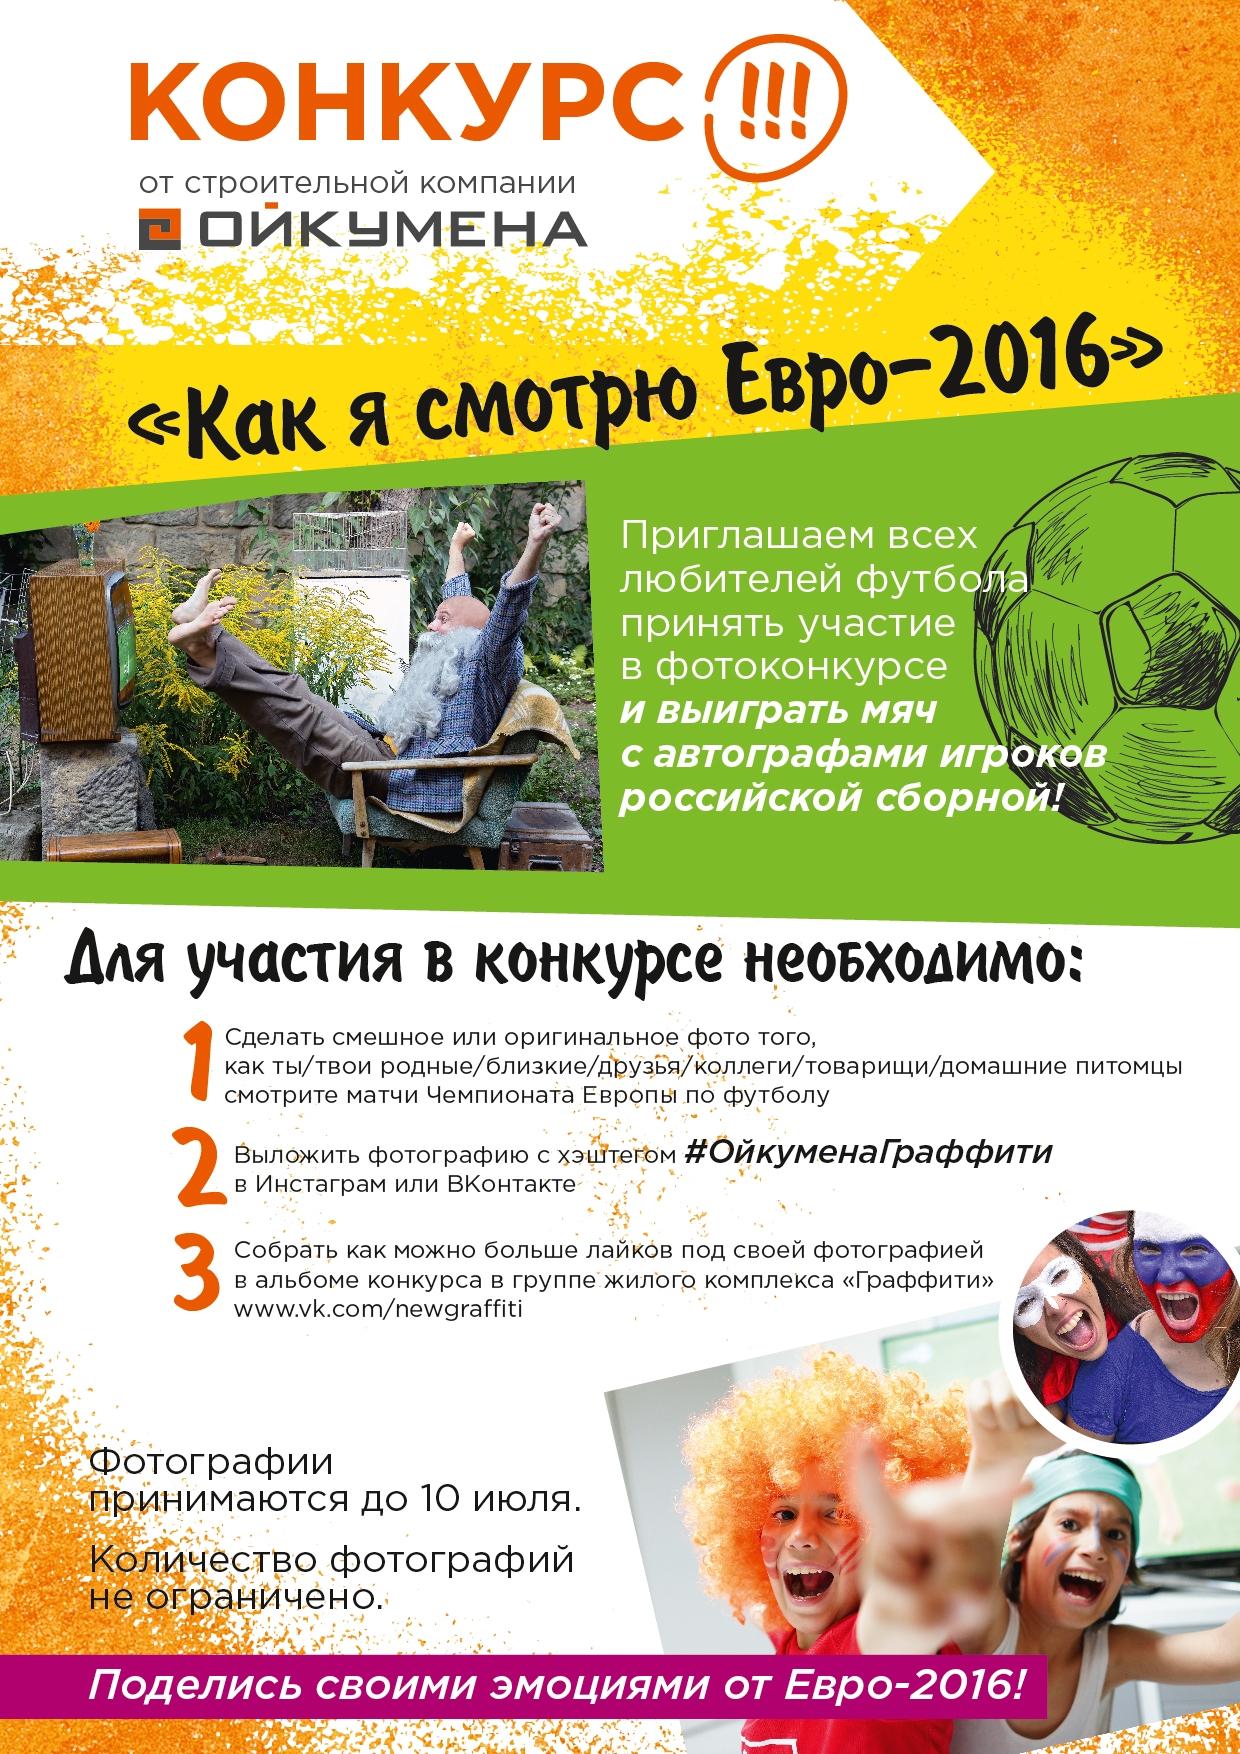 «Ойкумена» запускает конкурс к Евро-2016